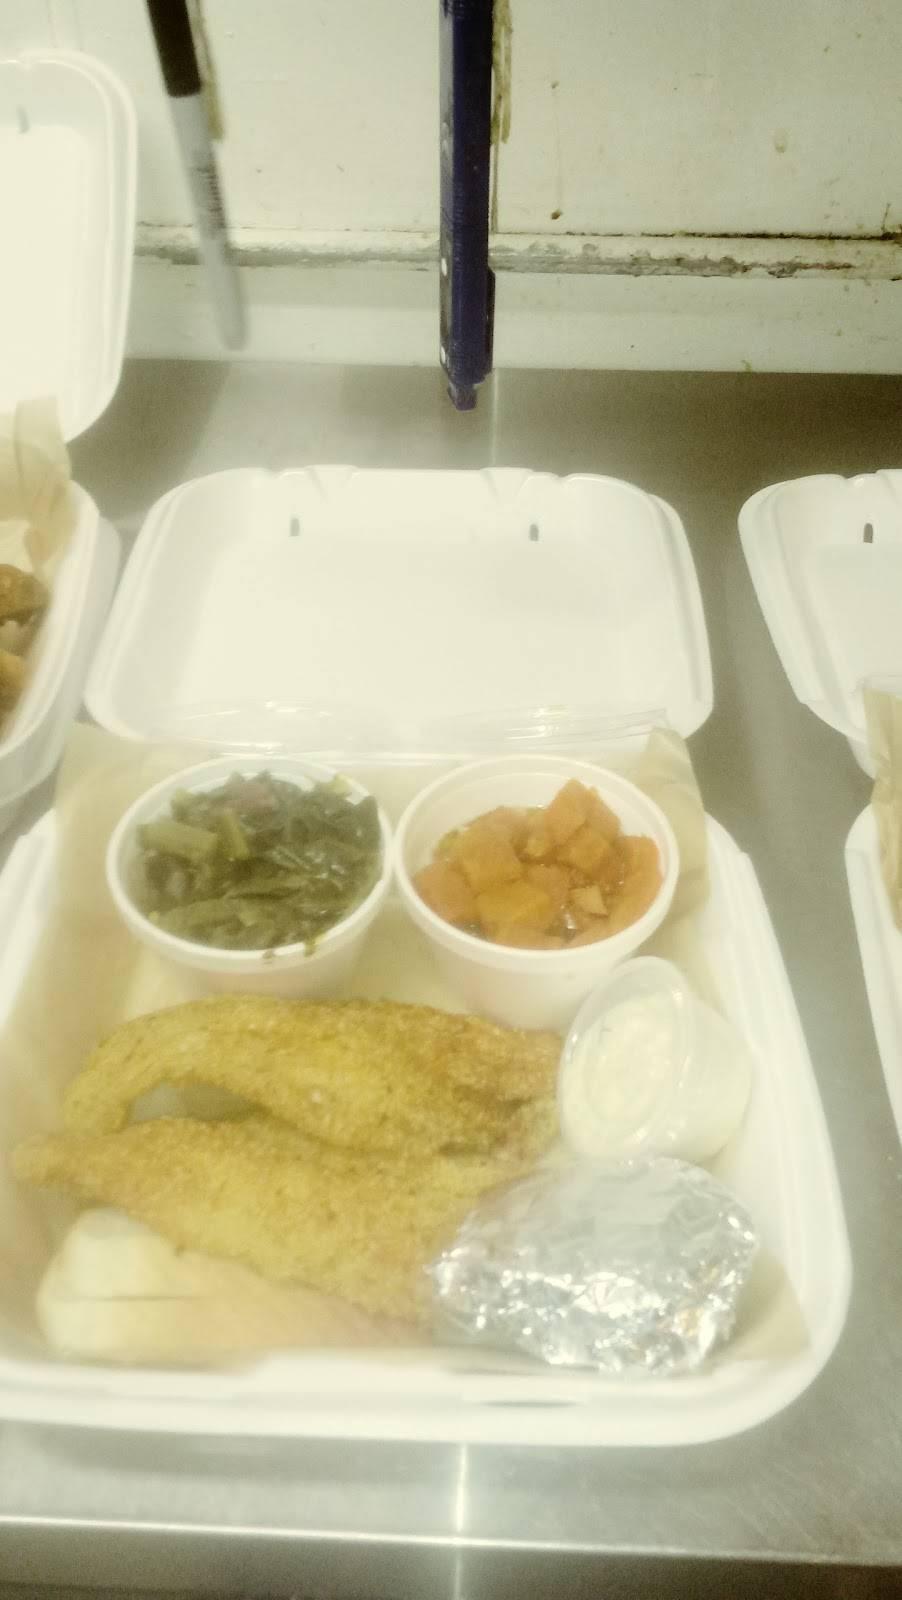 The Blazing Chicken Shack II - restaurant  | Photo 6 of 10 | Address: 5560 E 33rd Ave, Denver, CO 80207, USA | Phone: (720) 596-4501